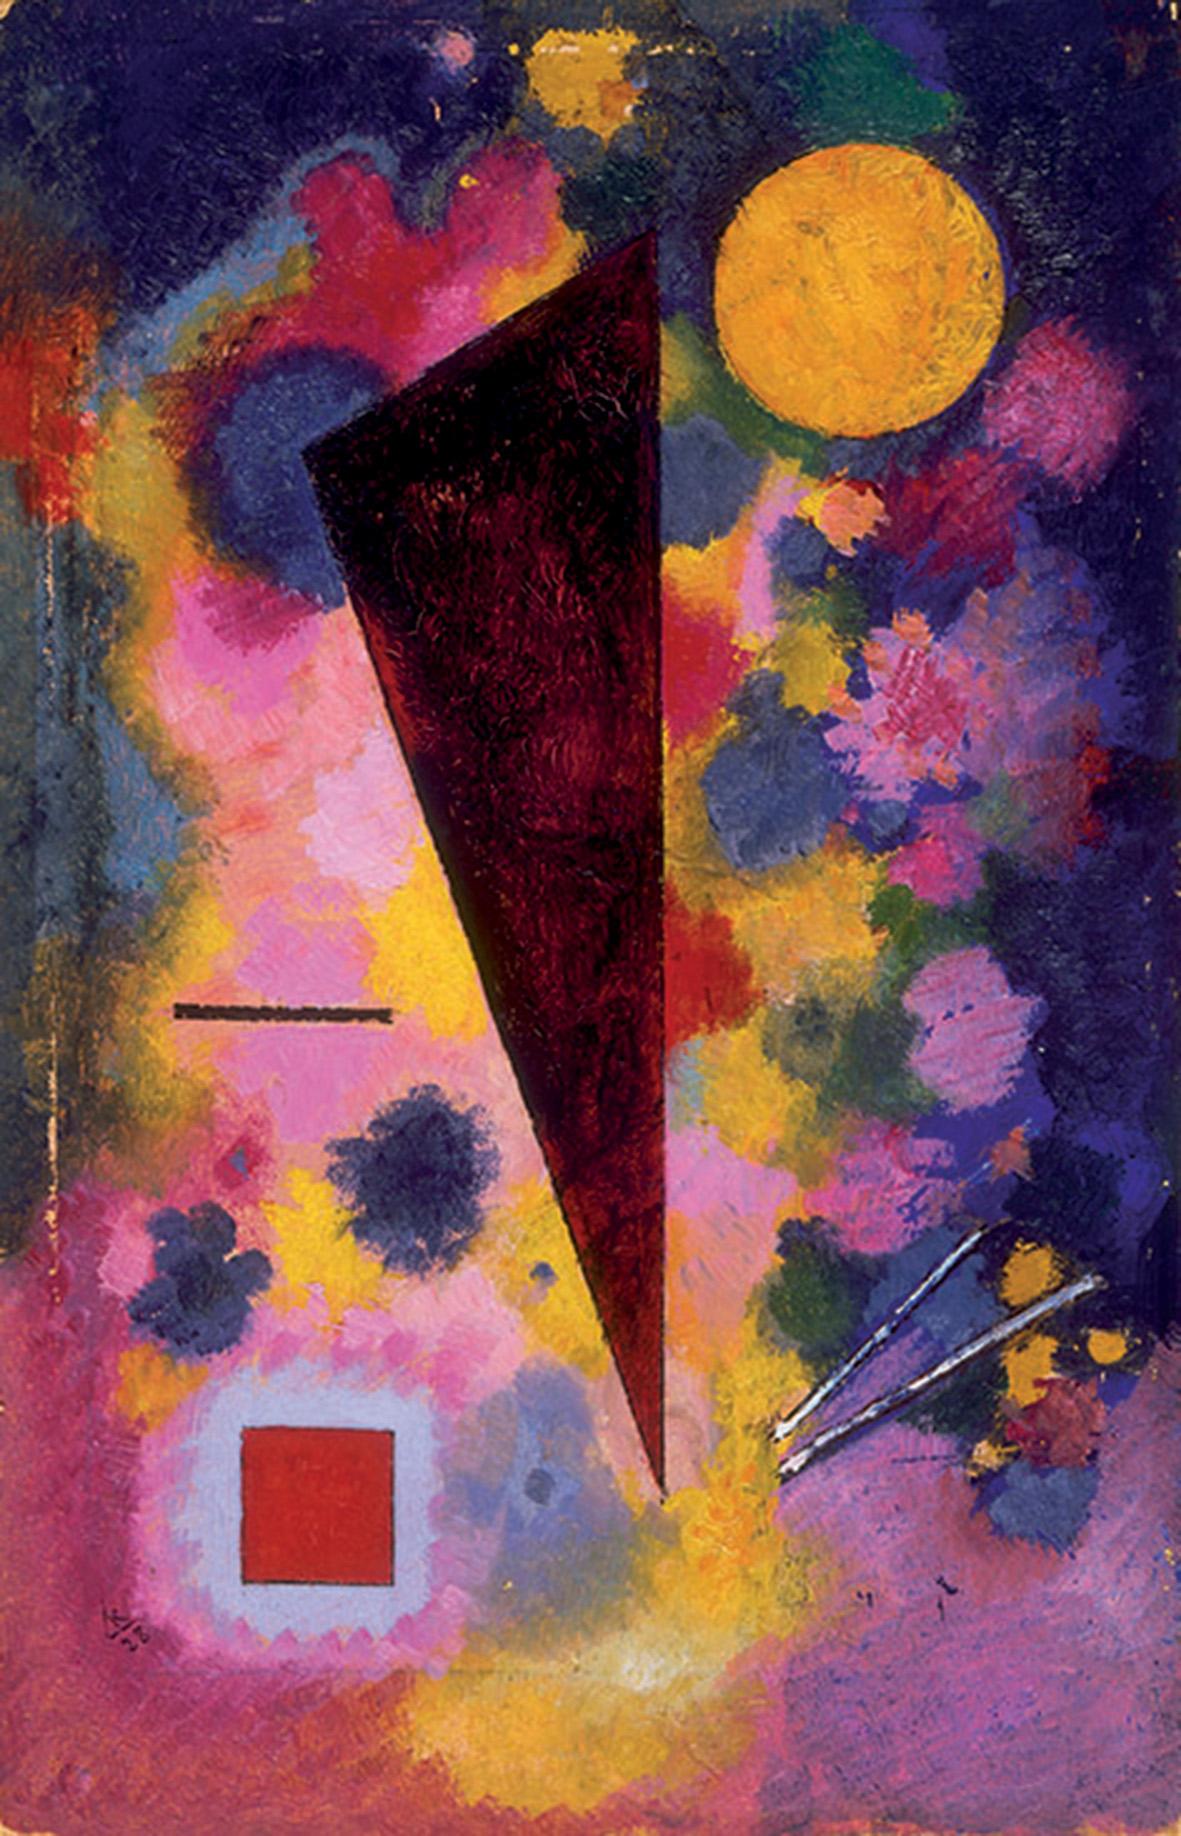 Vassily Kansindsky, Bunter Risonanza Multicolore, 1928, olio su cartone. Parigi, Centre Pompidou